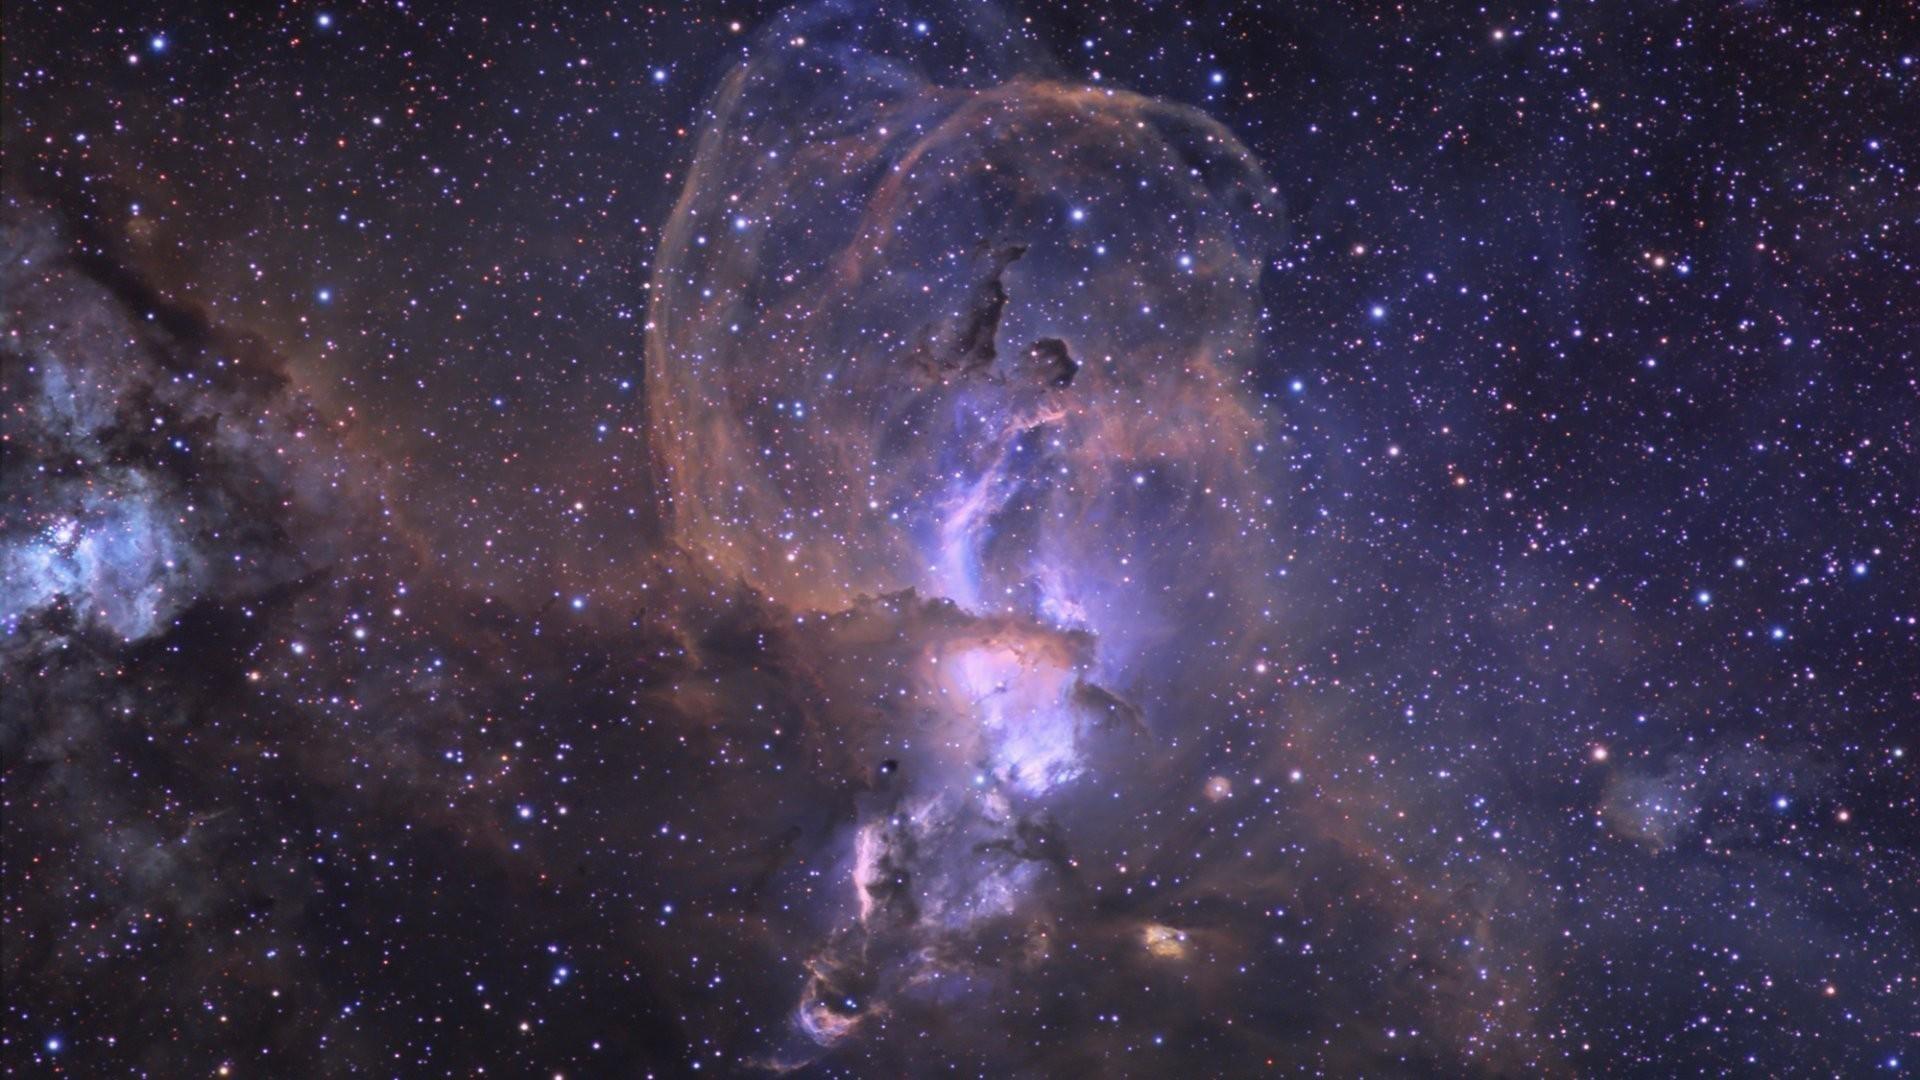 wallpaper.wiki-Hubble-HD-Background-1920×1080-PIC-WPD003227